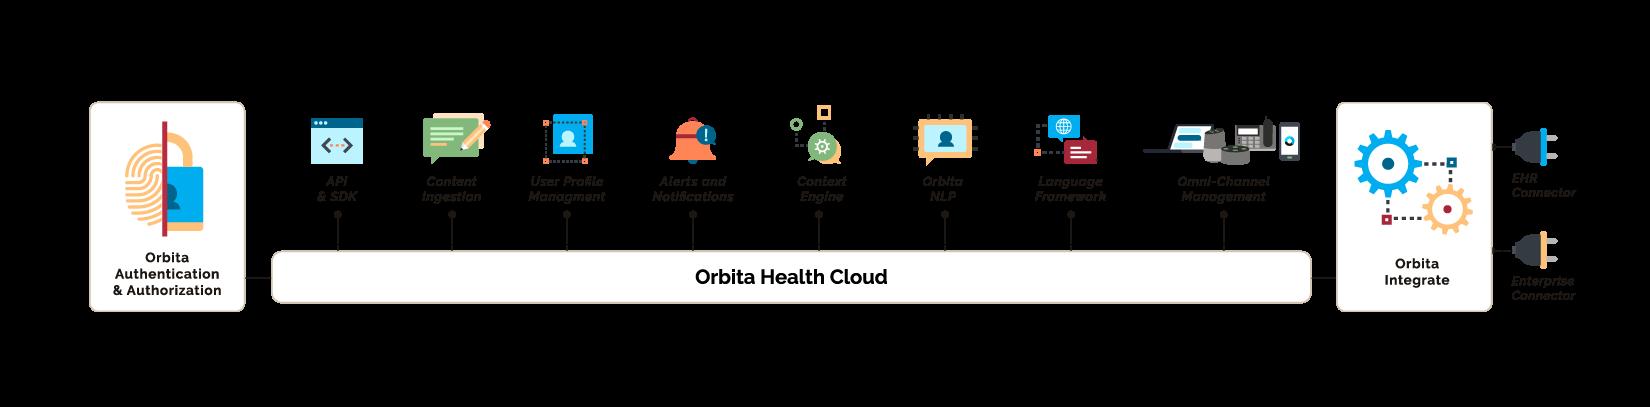 Orbita Platform webpage featuring core platform modules graphic